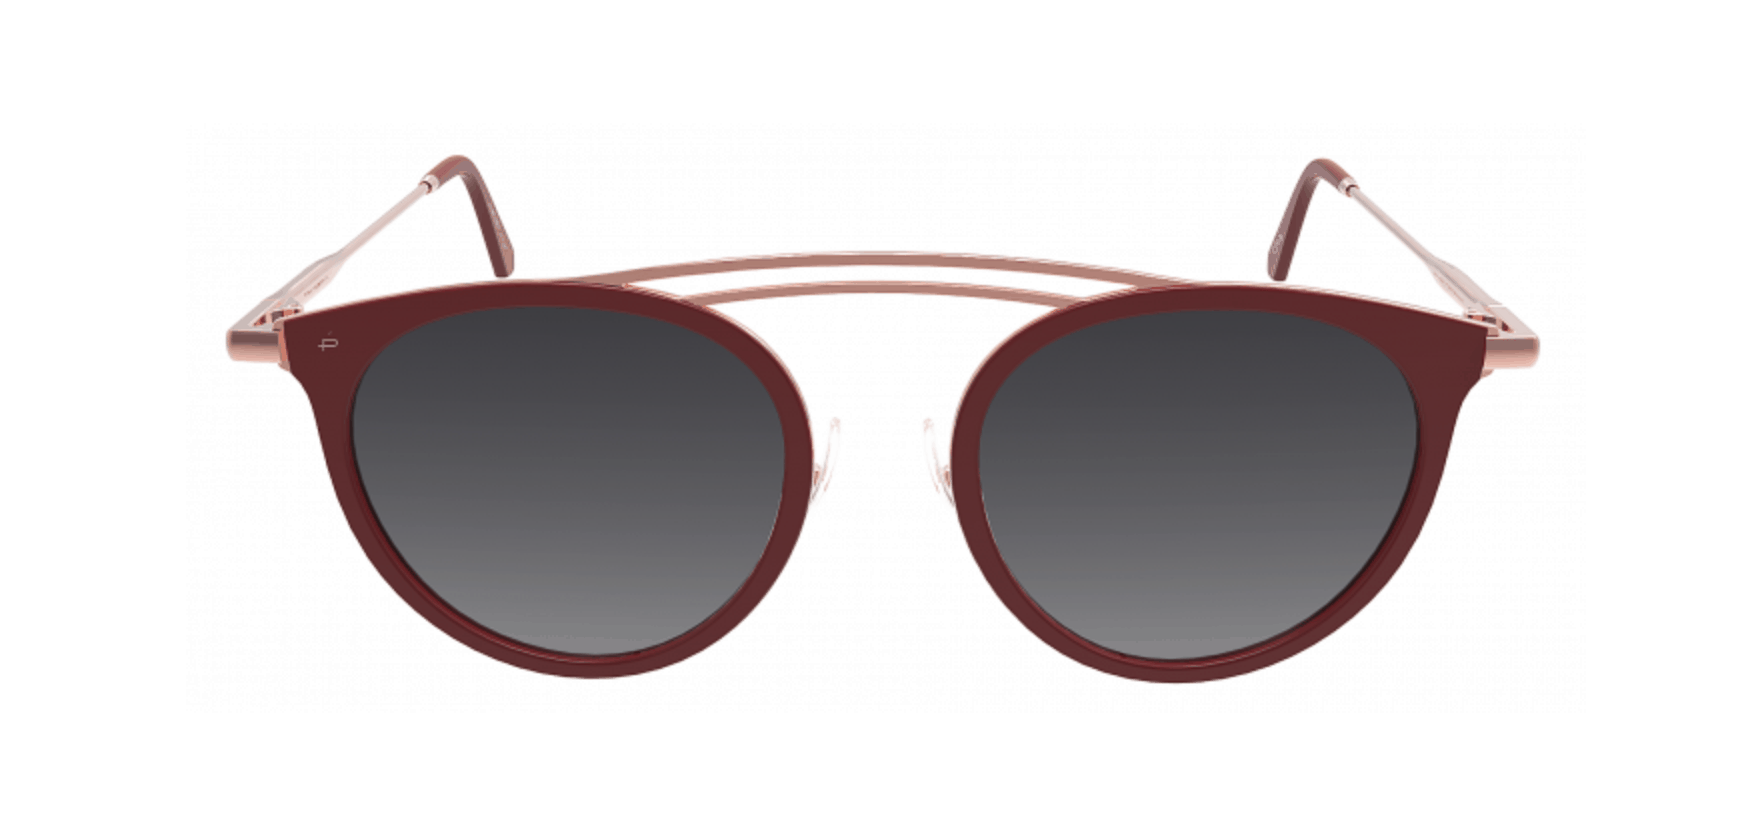 Rogue sunglasses.